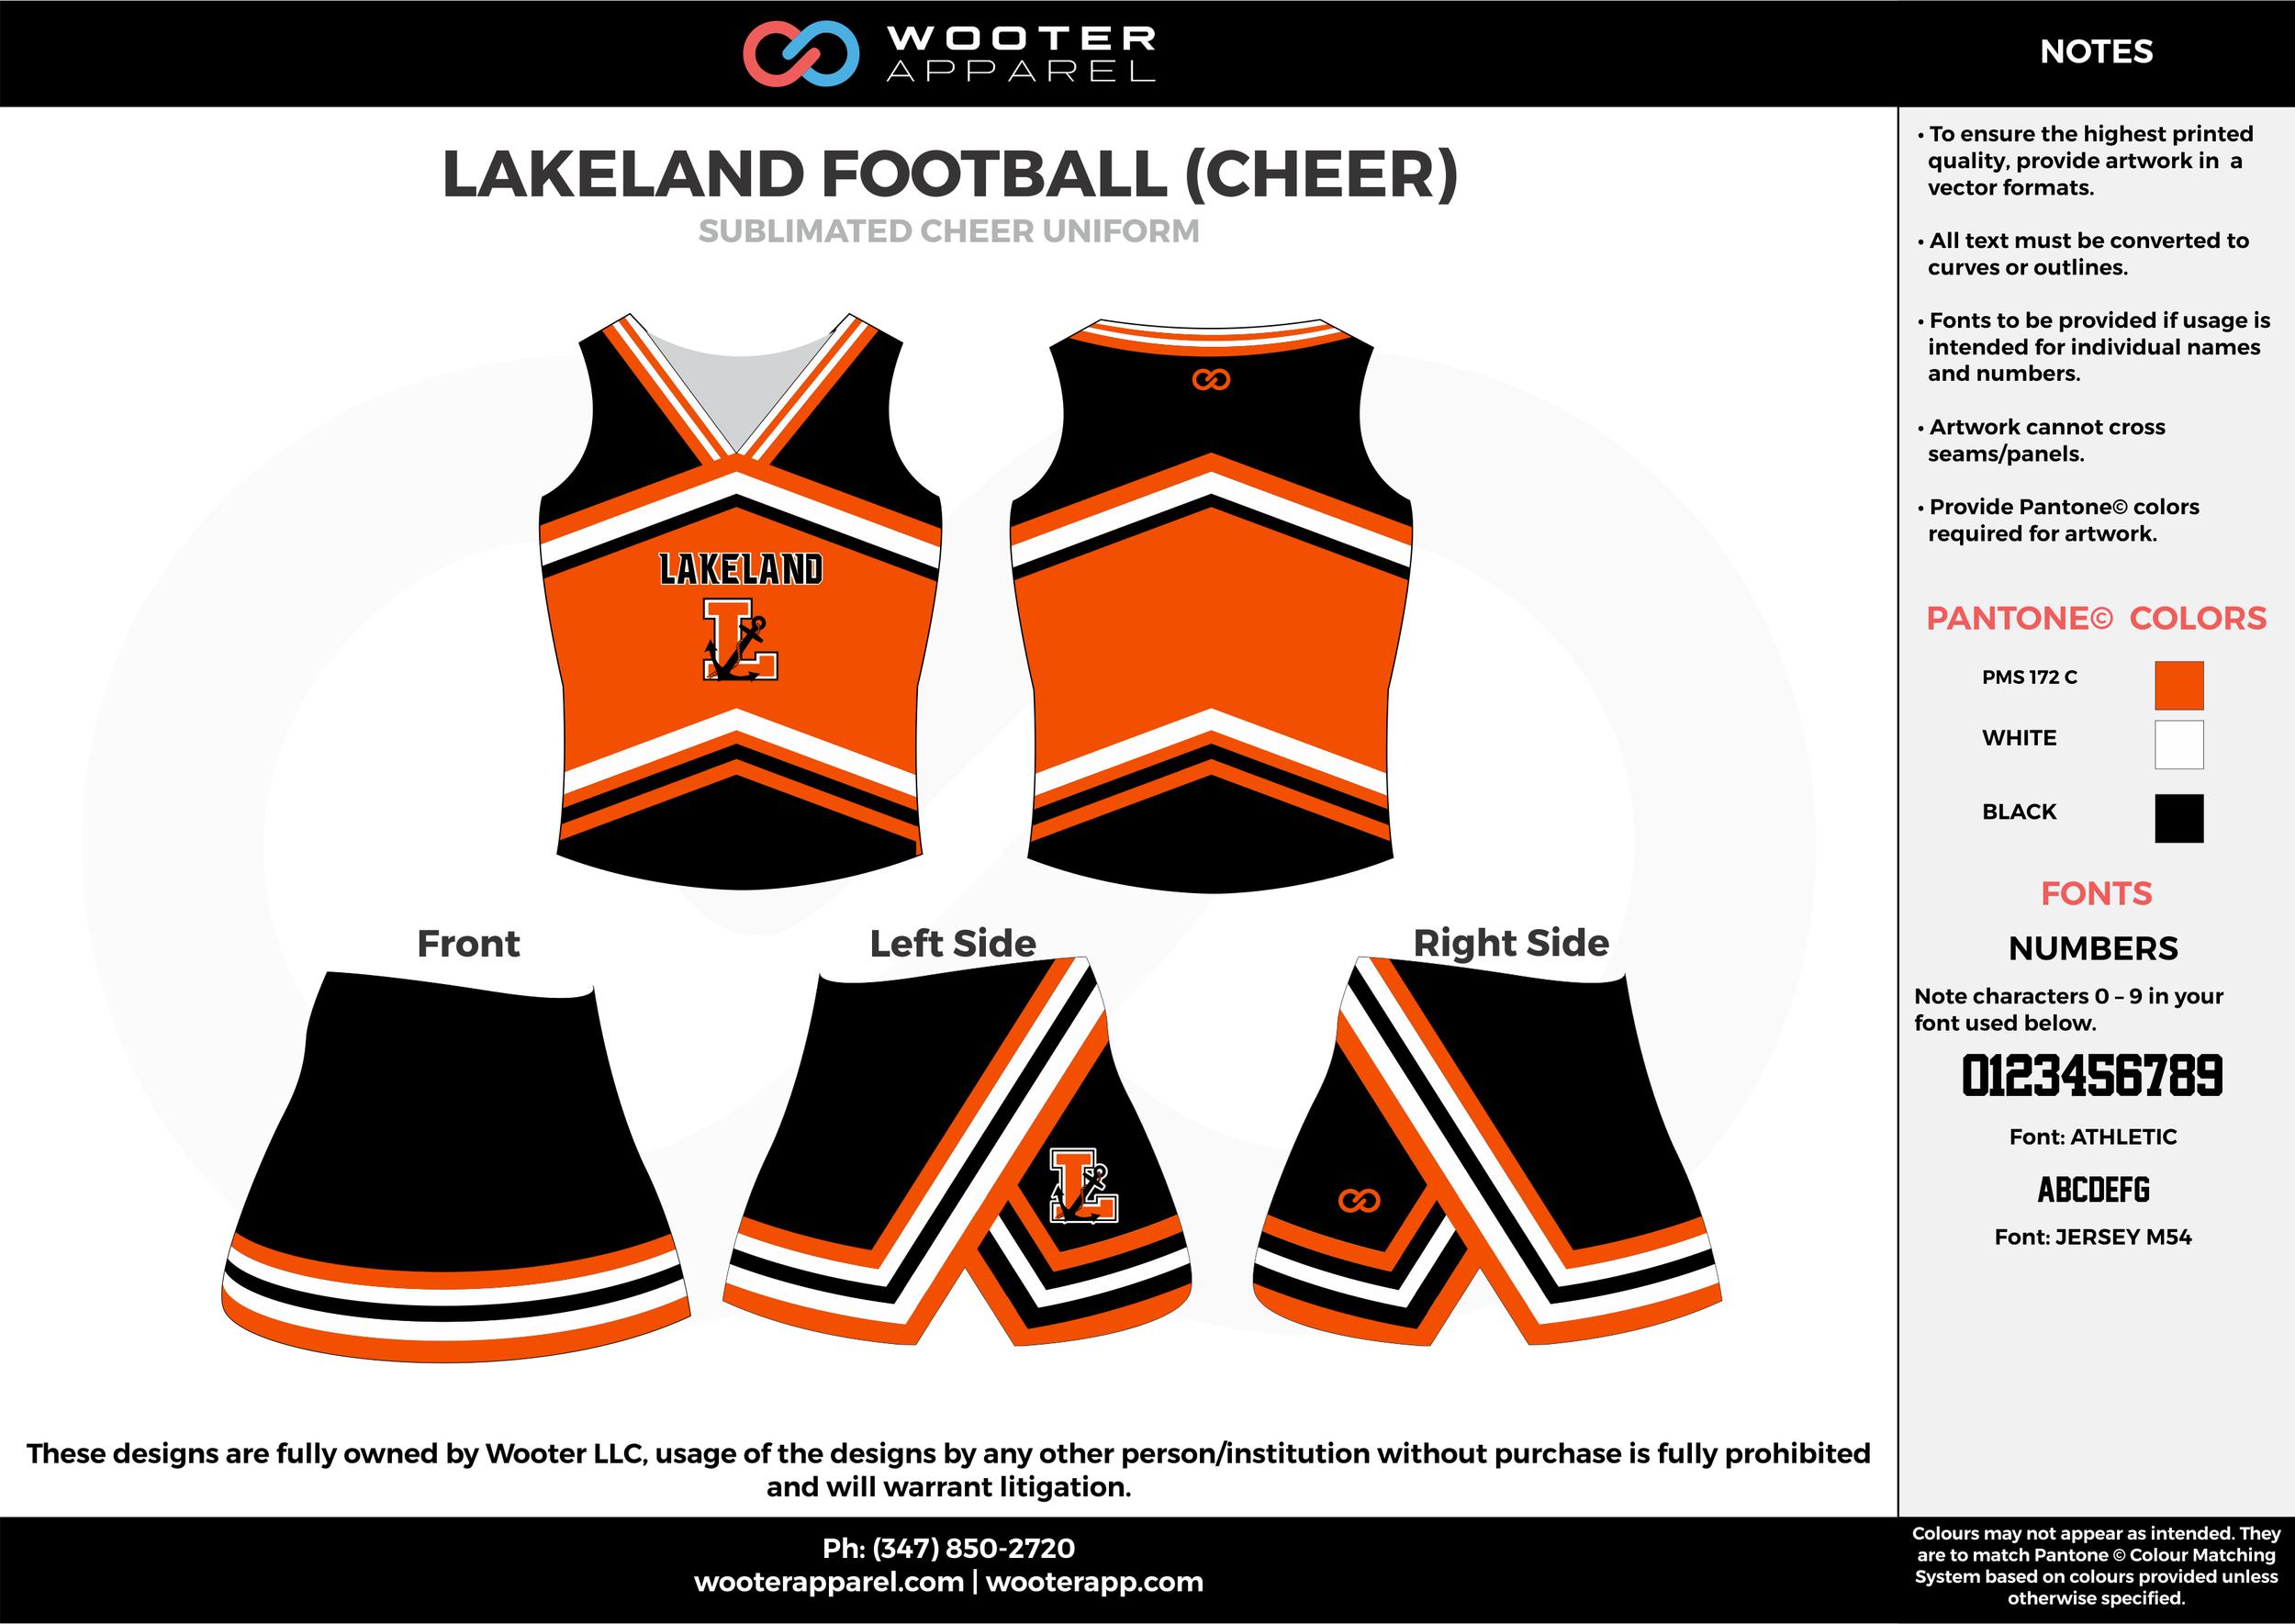 LAKELAND FOOTBALL orange black cheerleading uniforms, top, and skirt